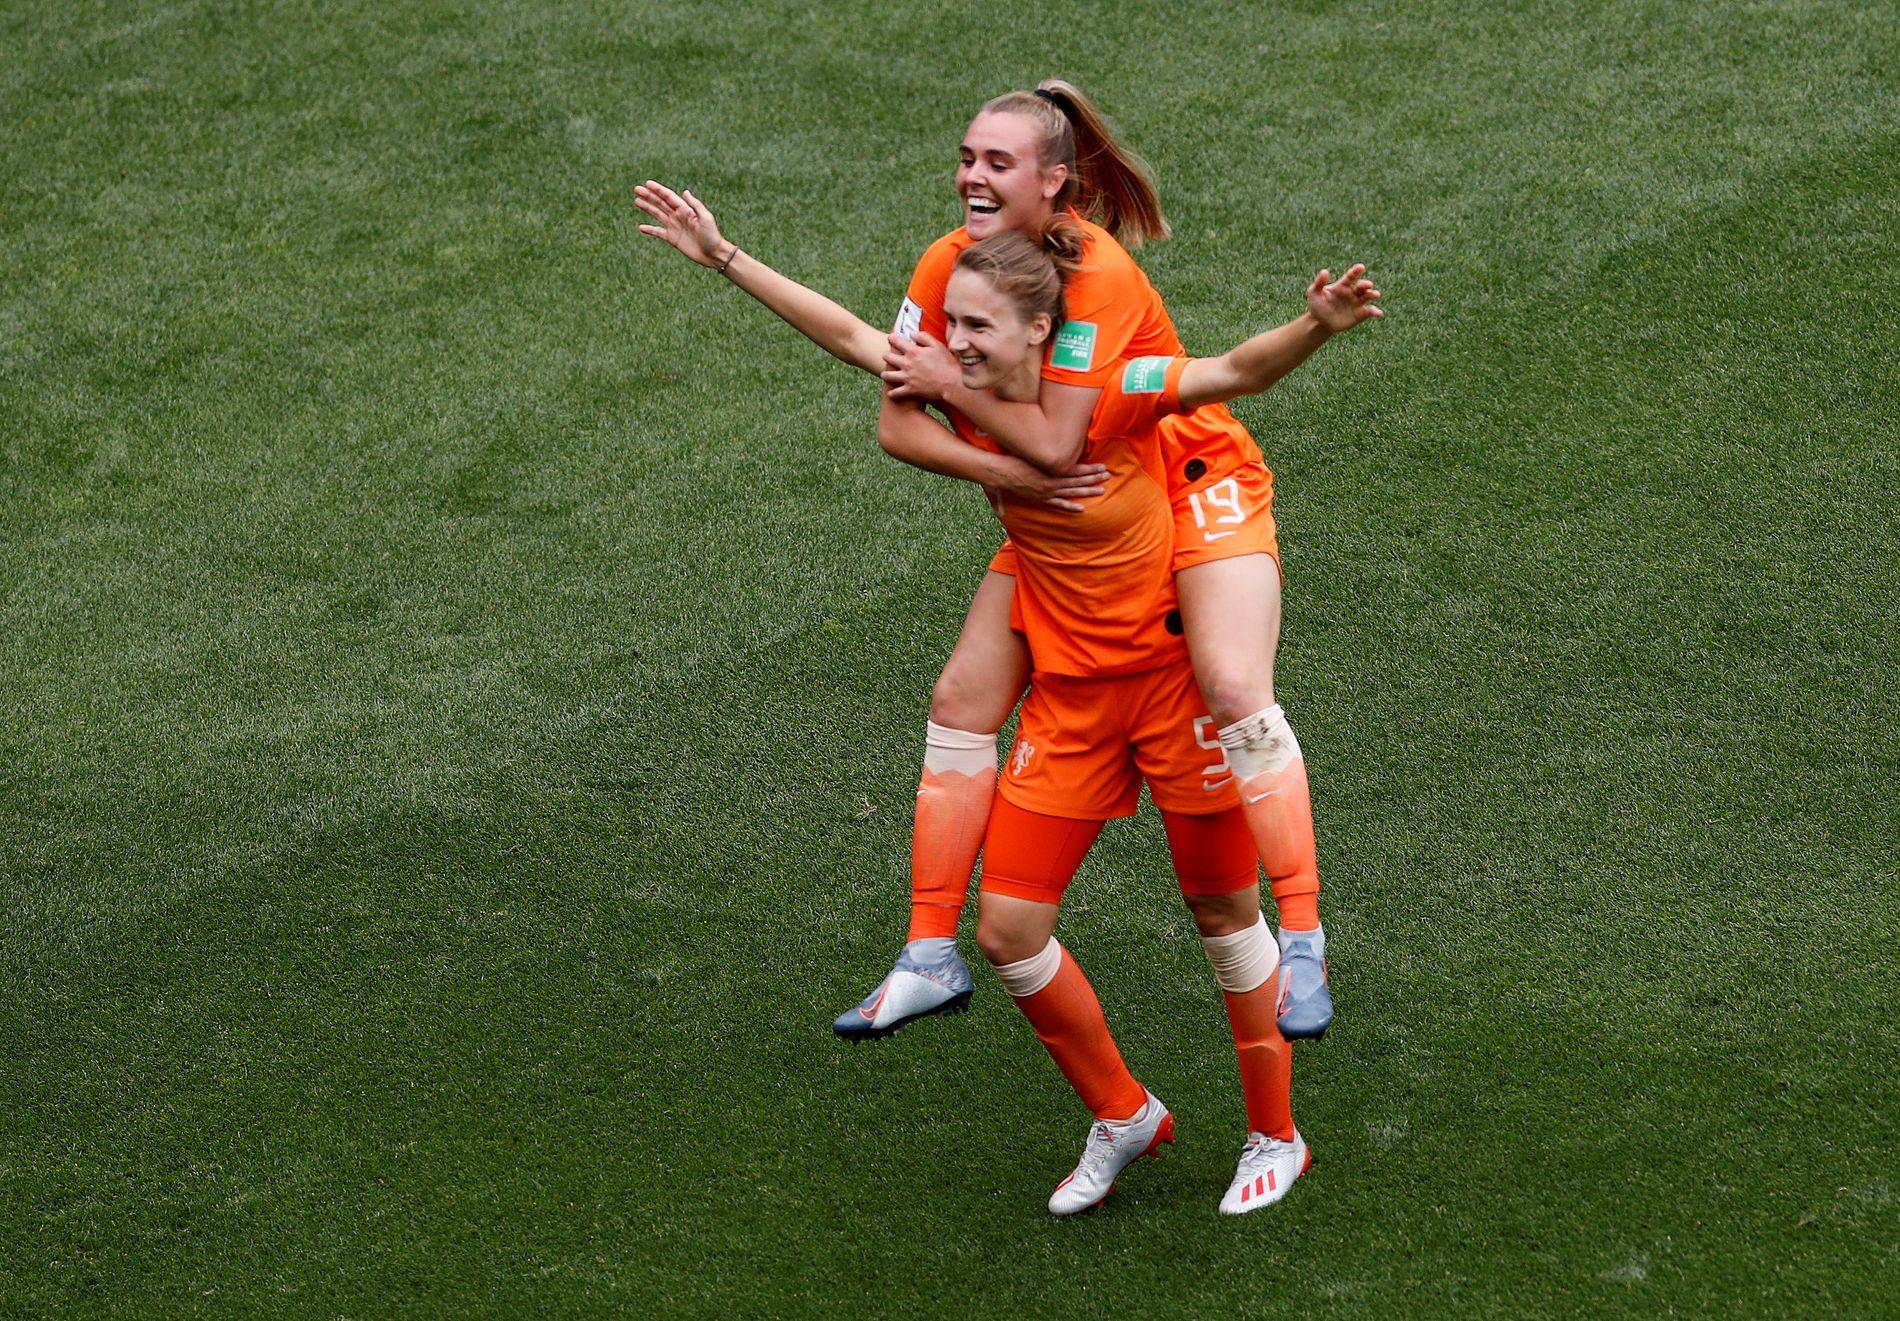 ORANSJE JUBEL: Arsenal-spiss Vivianne Miedema jubler med innbytter Jill Roord på ryggen etter sin 1–0-scoring mot Italia.